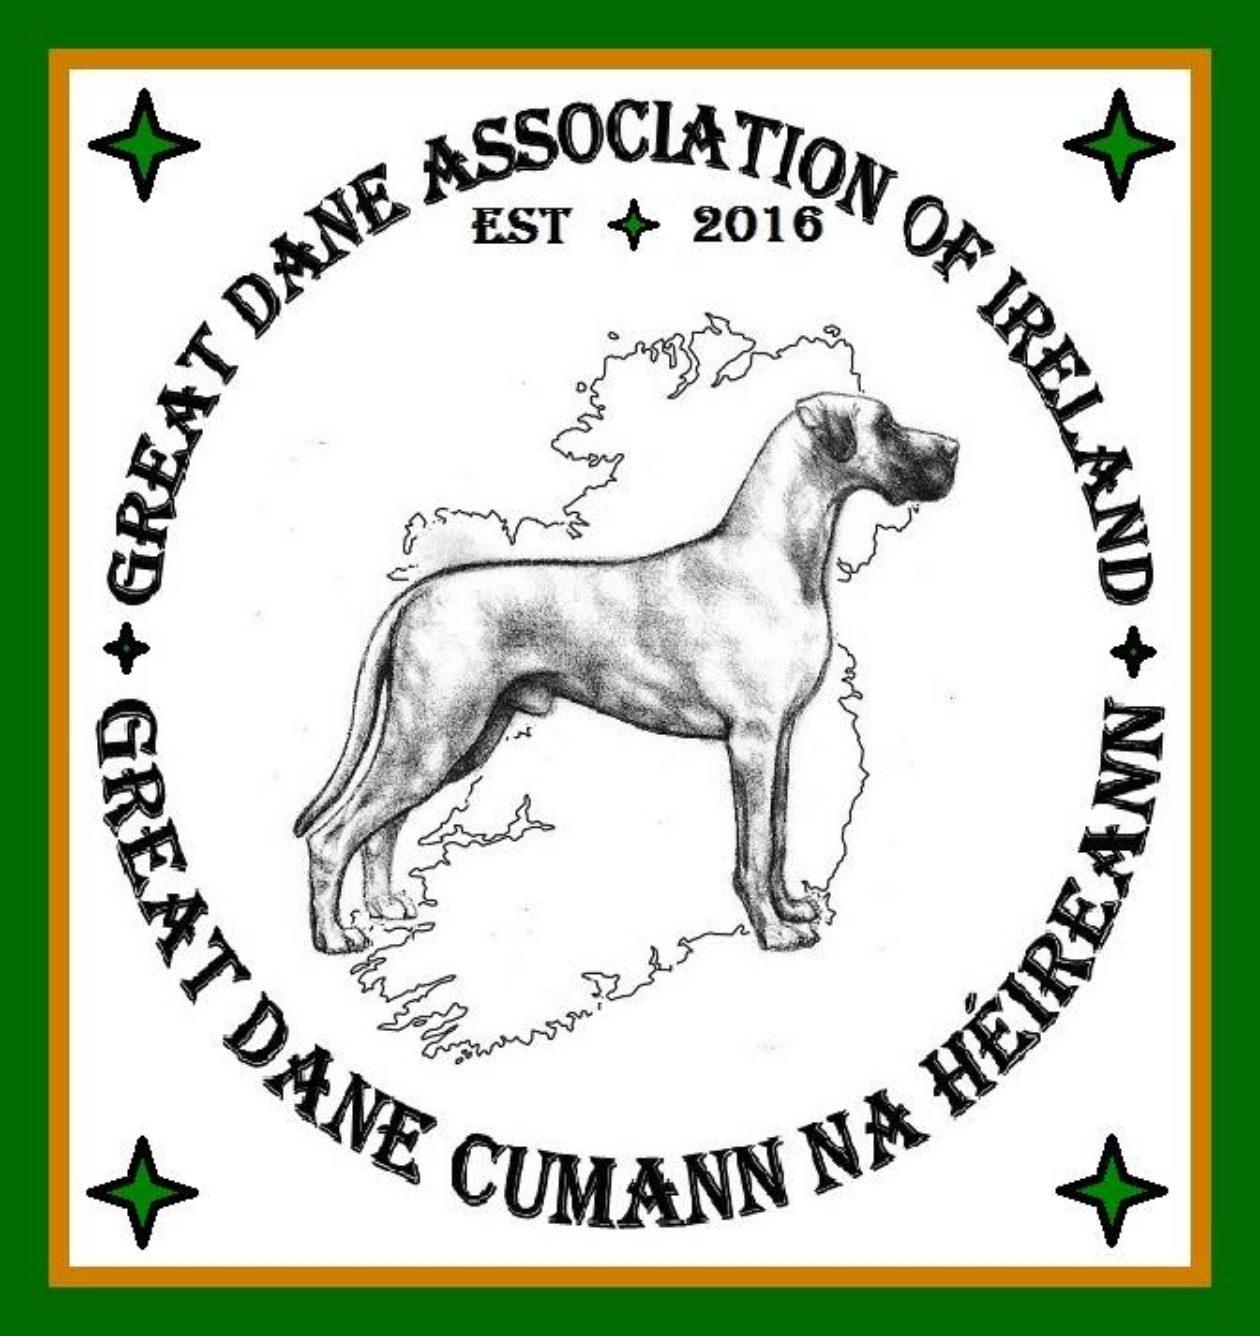 The Great Dane Association of Ireland